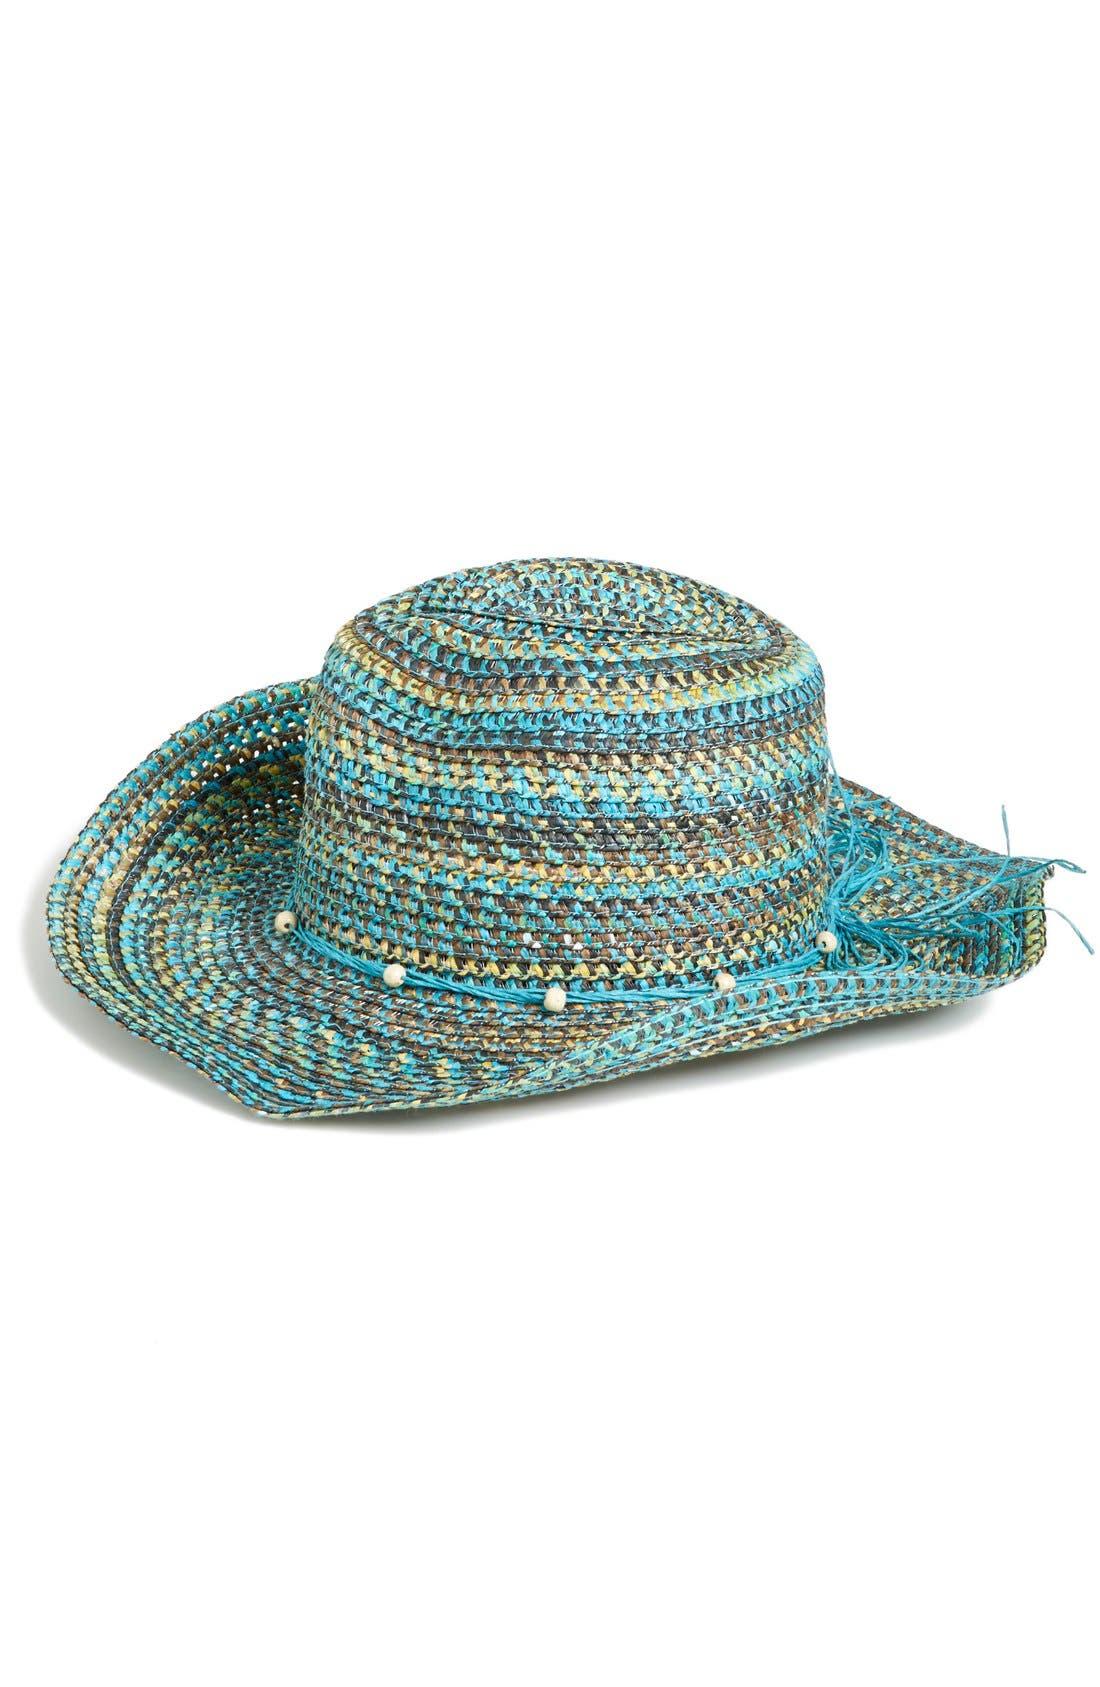 Alternate Image 1 Selected - T+C by Theodora & Callum Multicolor Straw Hat